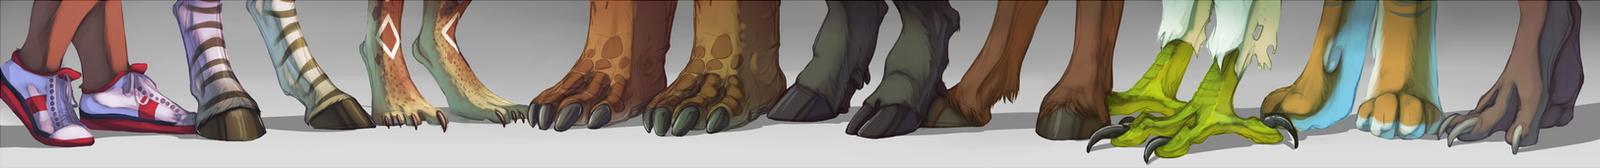 Cut Loose, Footloose! by Pheagle-Adler